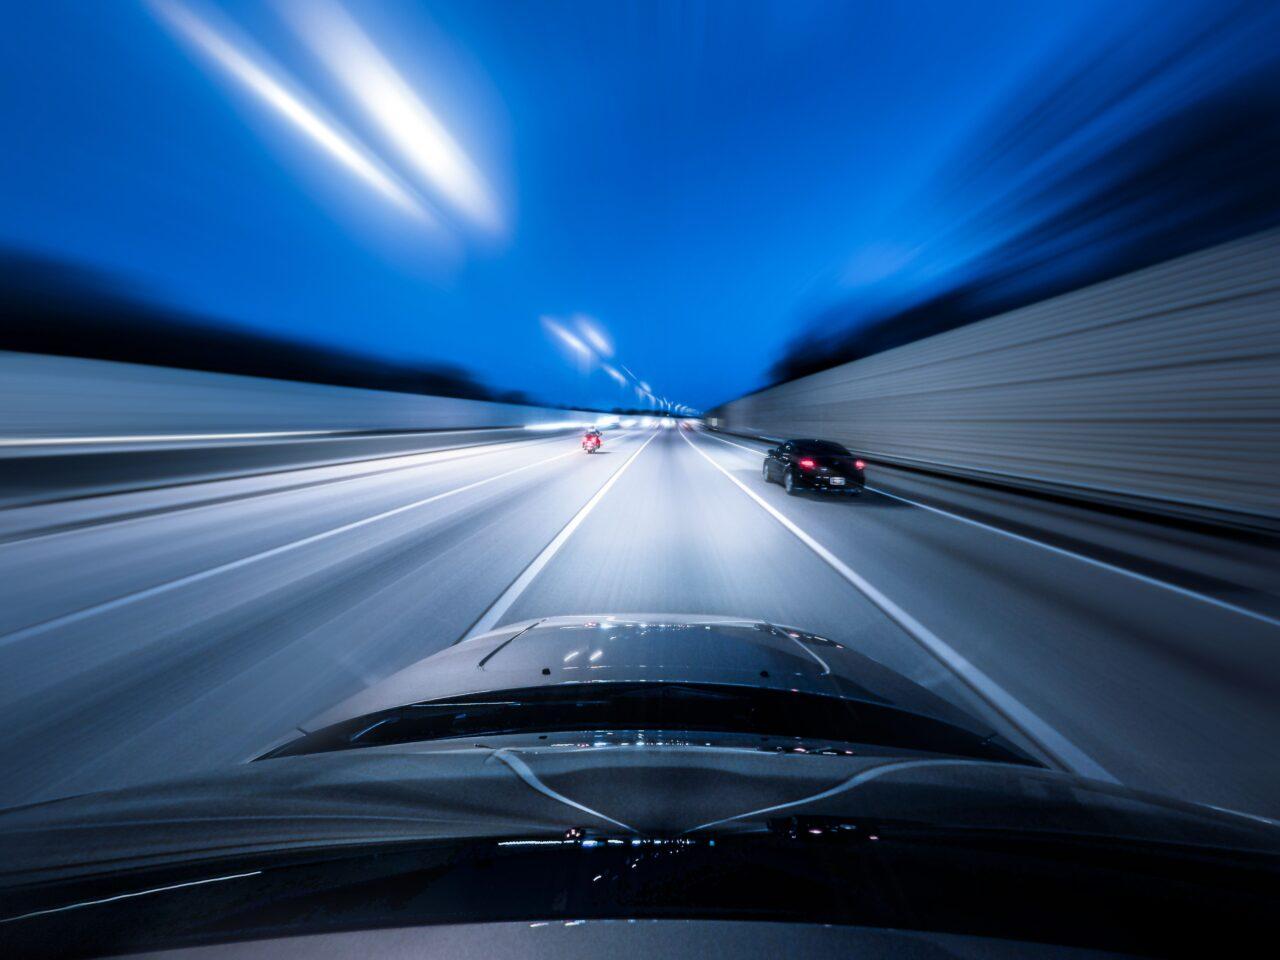 La hipnosis de carretera existe ¿les ha pasado?